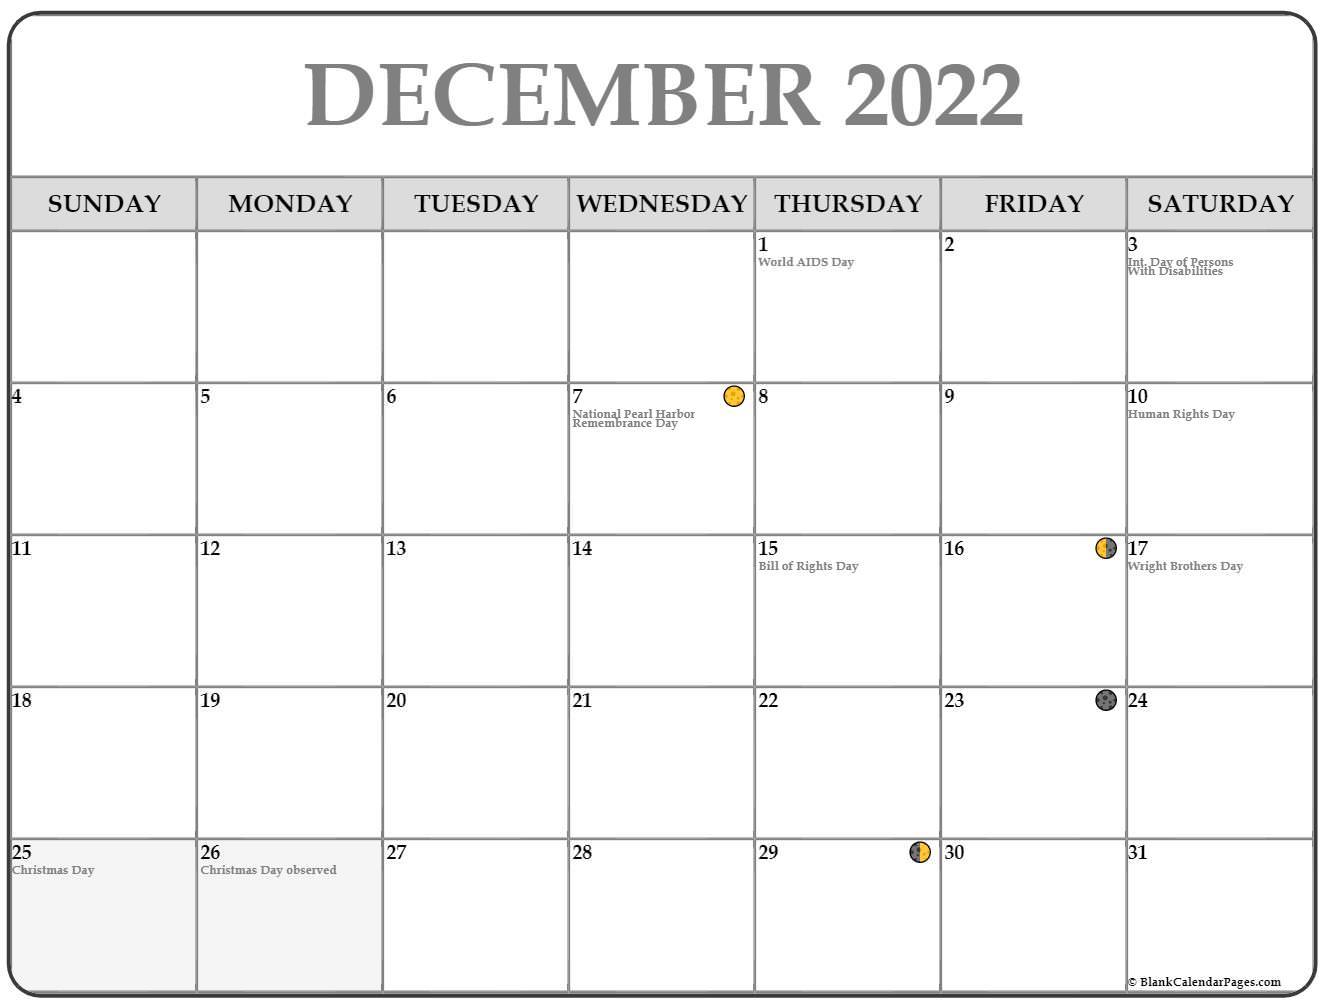 Moon Calendar December 2022.December 2022 Lunar Calendar Moon Phase Calendar